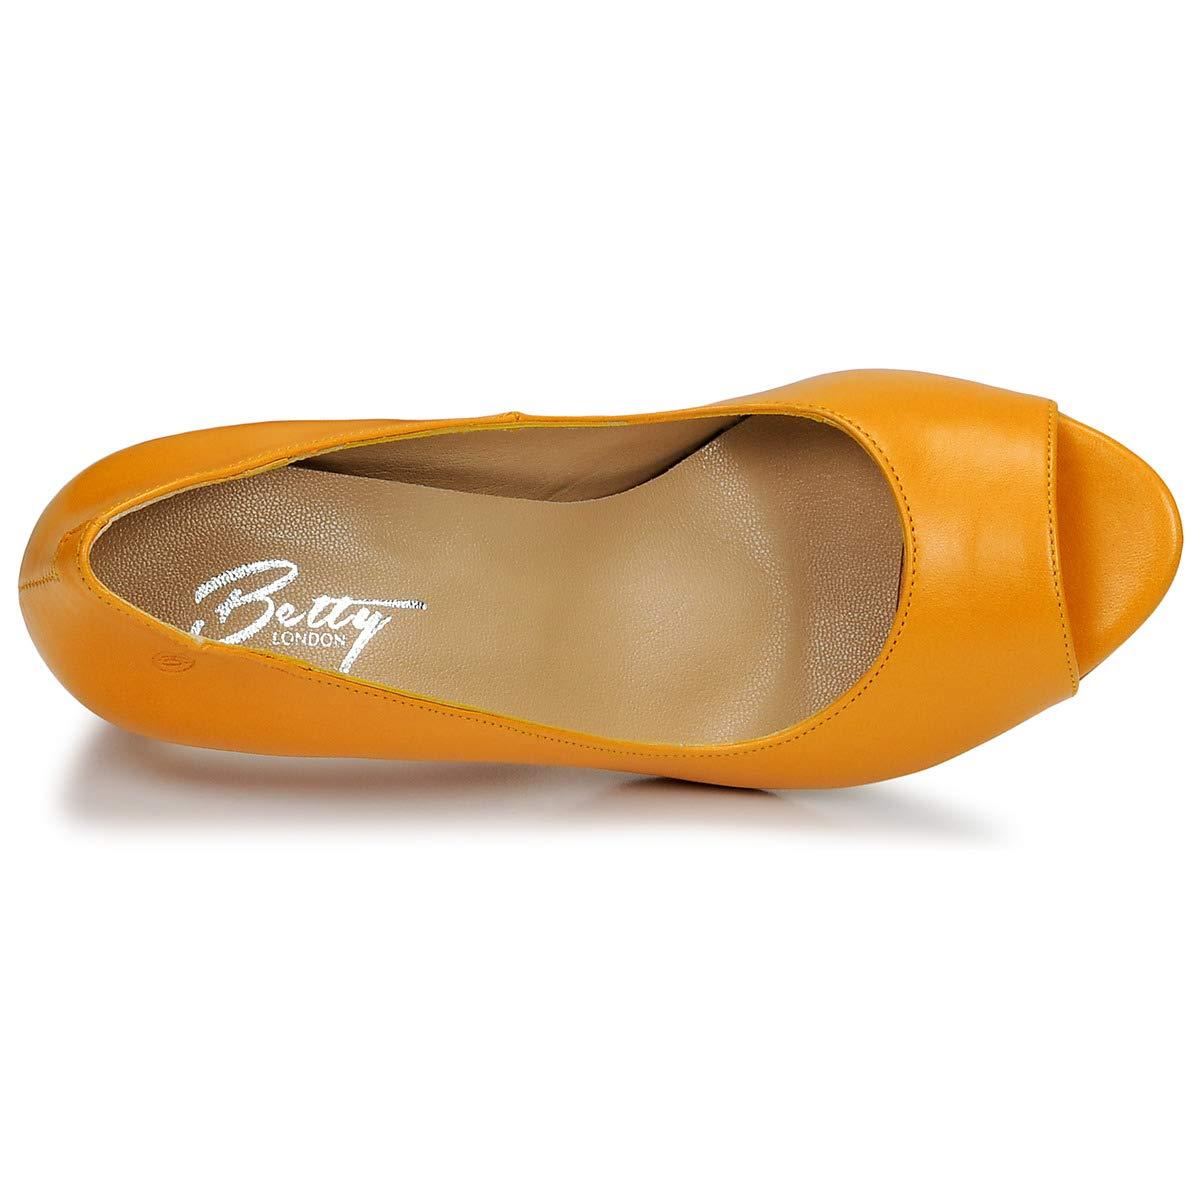 Betty Betty Betty London Emana Pumps Damen Gelb Pumps af7954